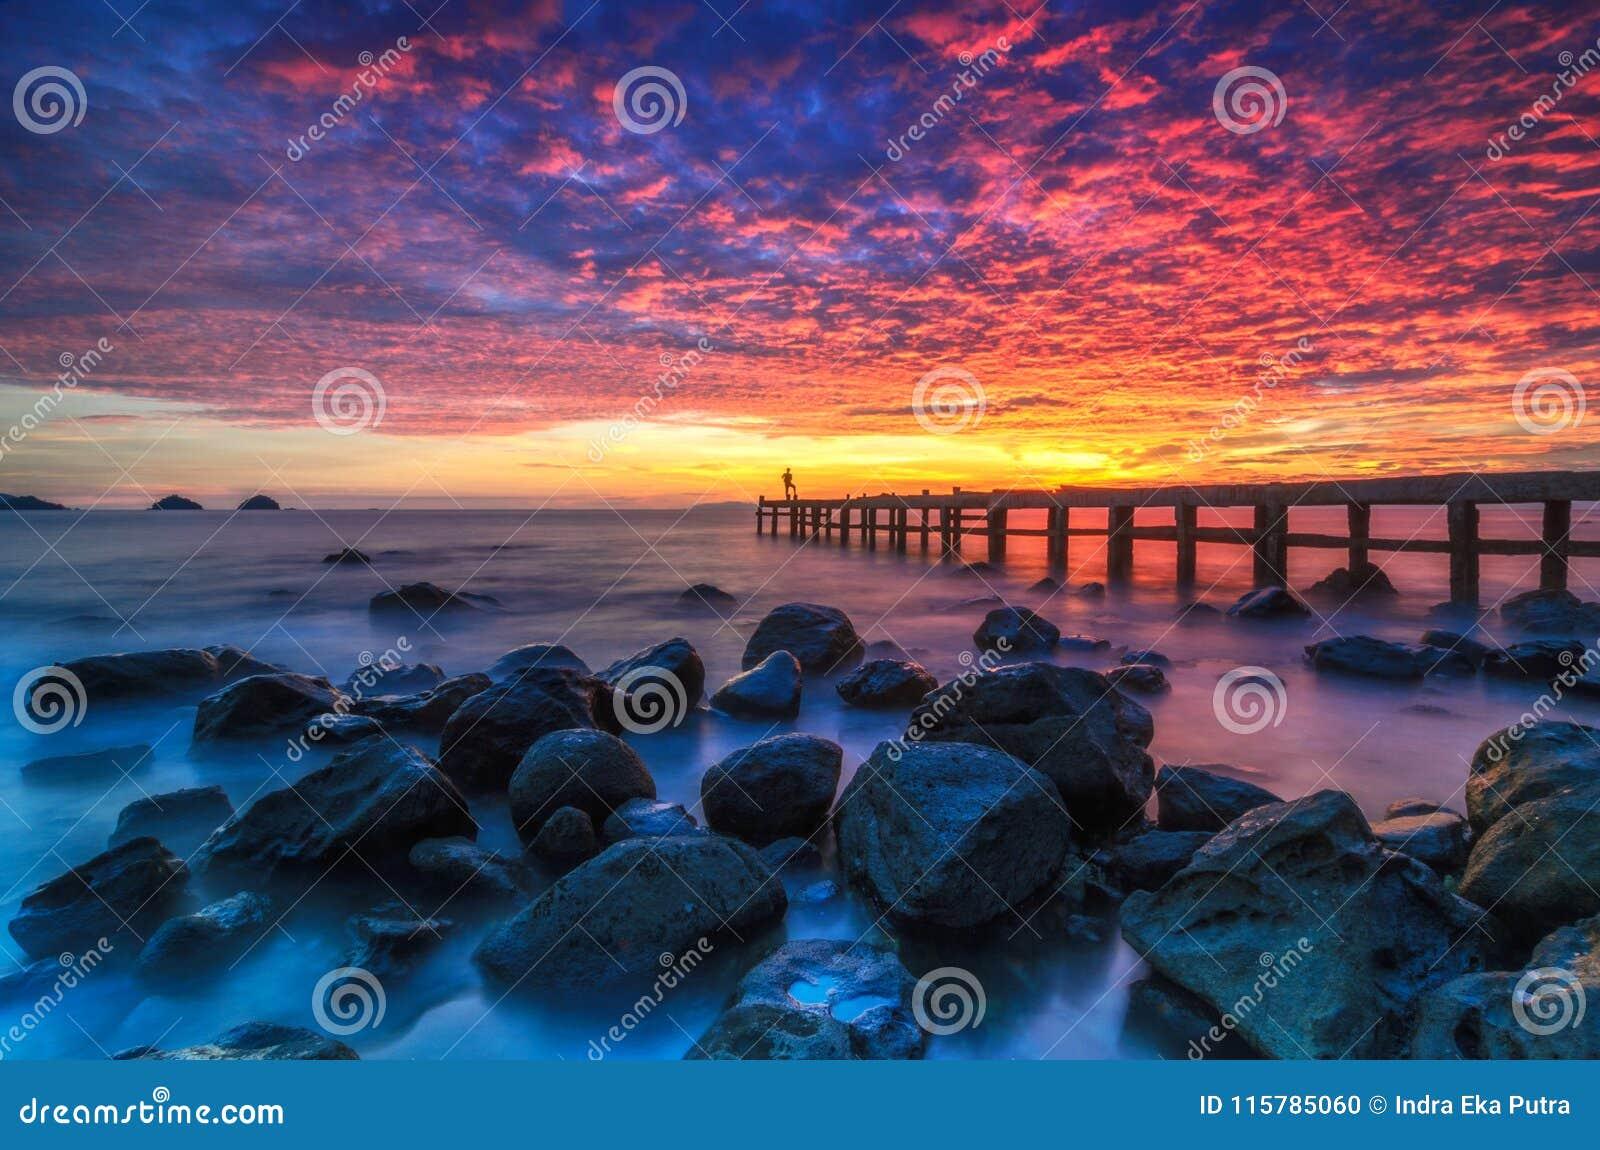 The sky at sunset at Setigi Heni Beach